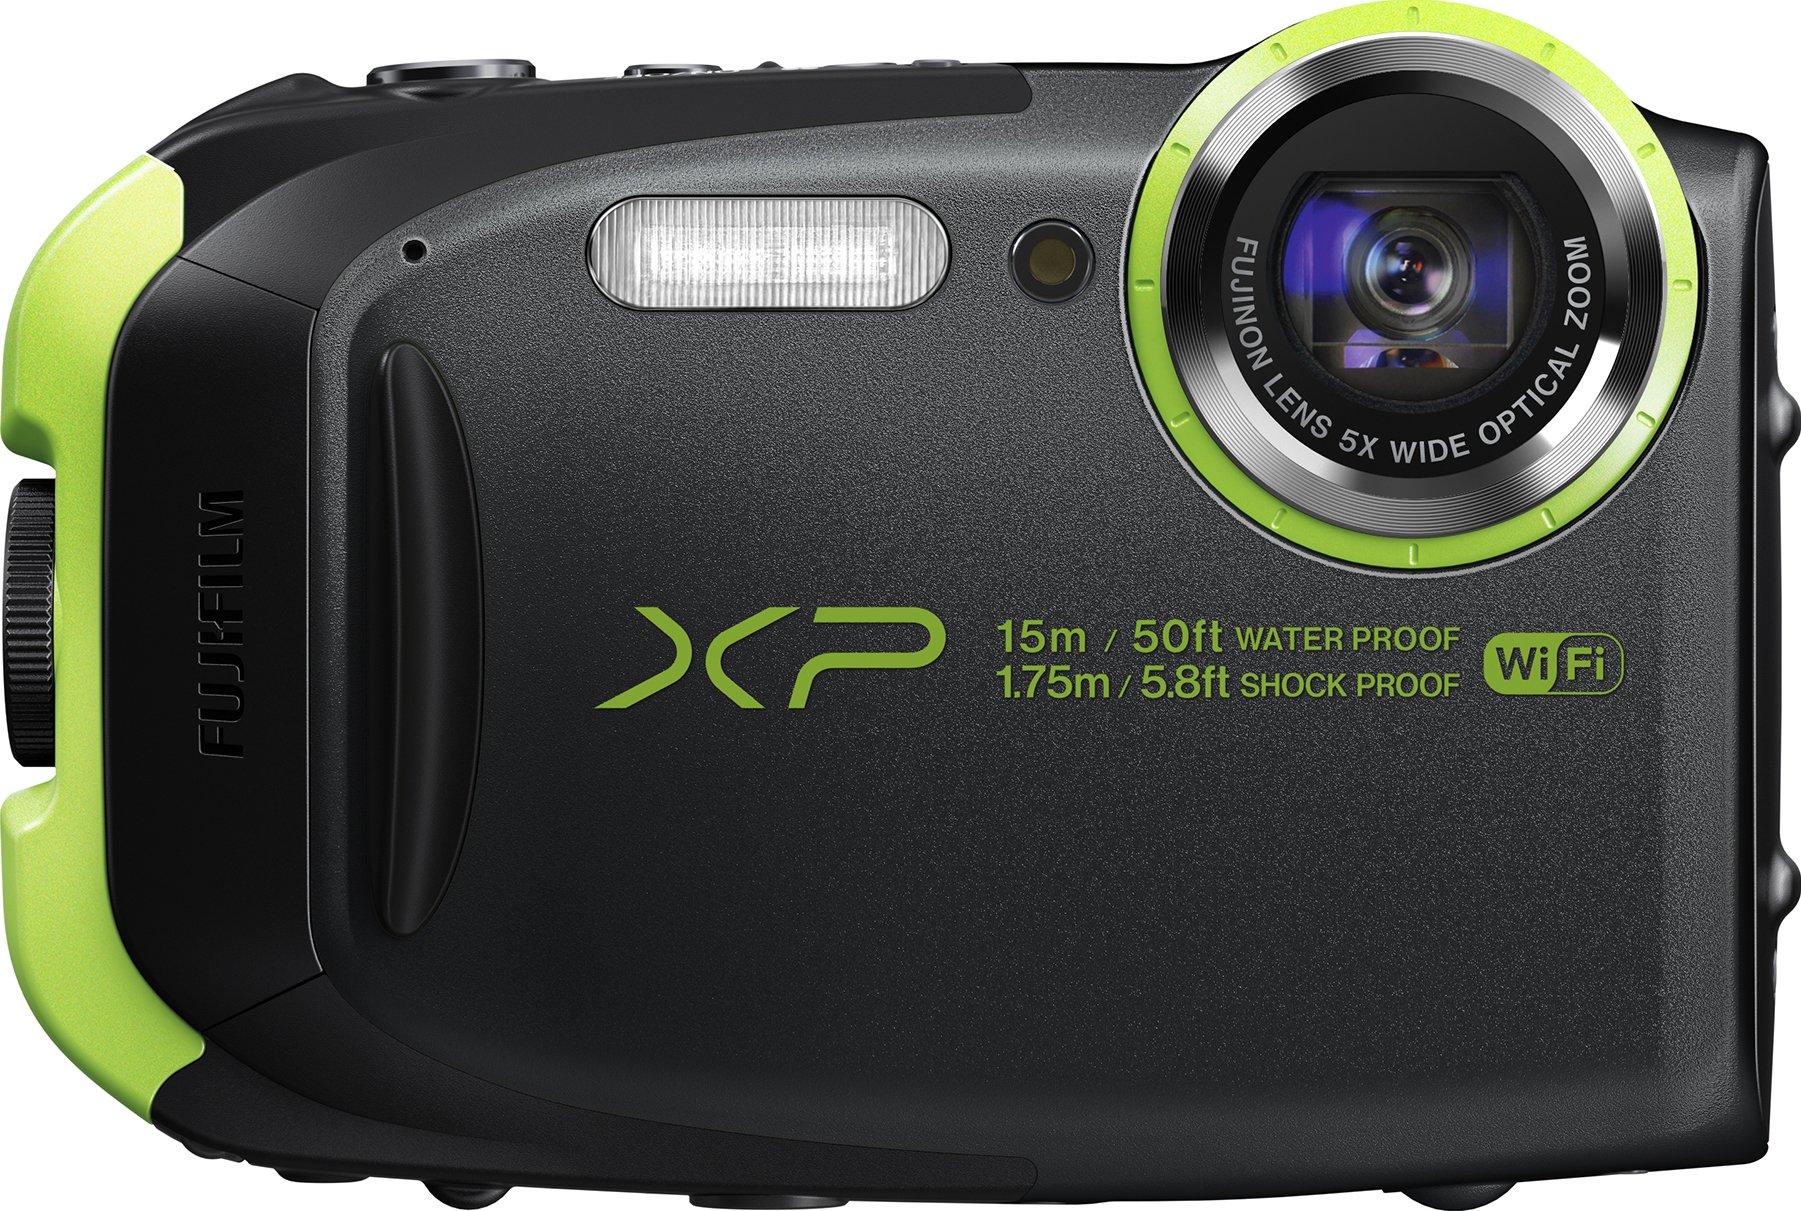 Fujifilm FinePix XP80 Waterproof Digital Camera with 2.7-Inch LCD (Graphite Black) by Fujifilm